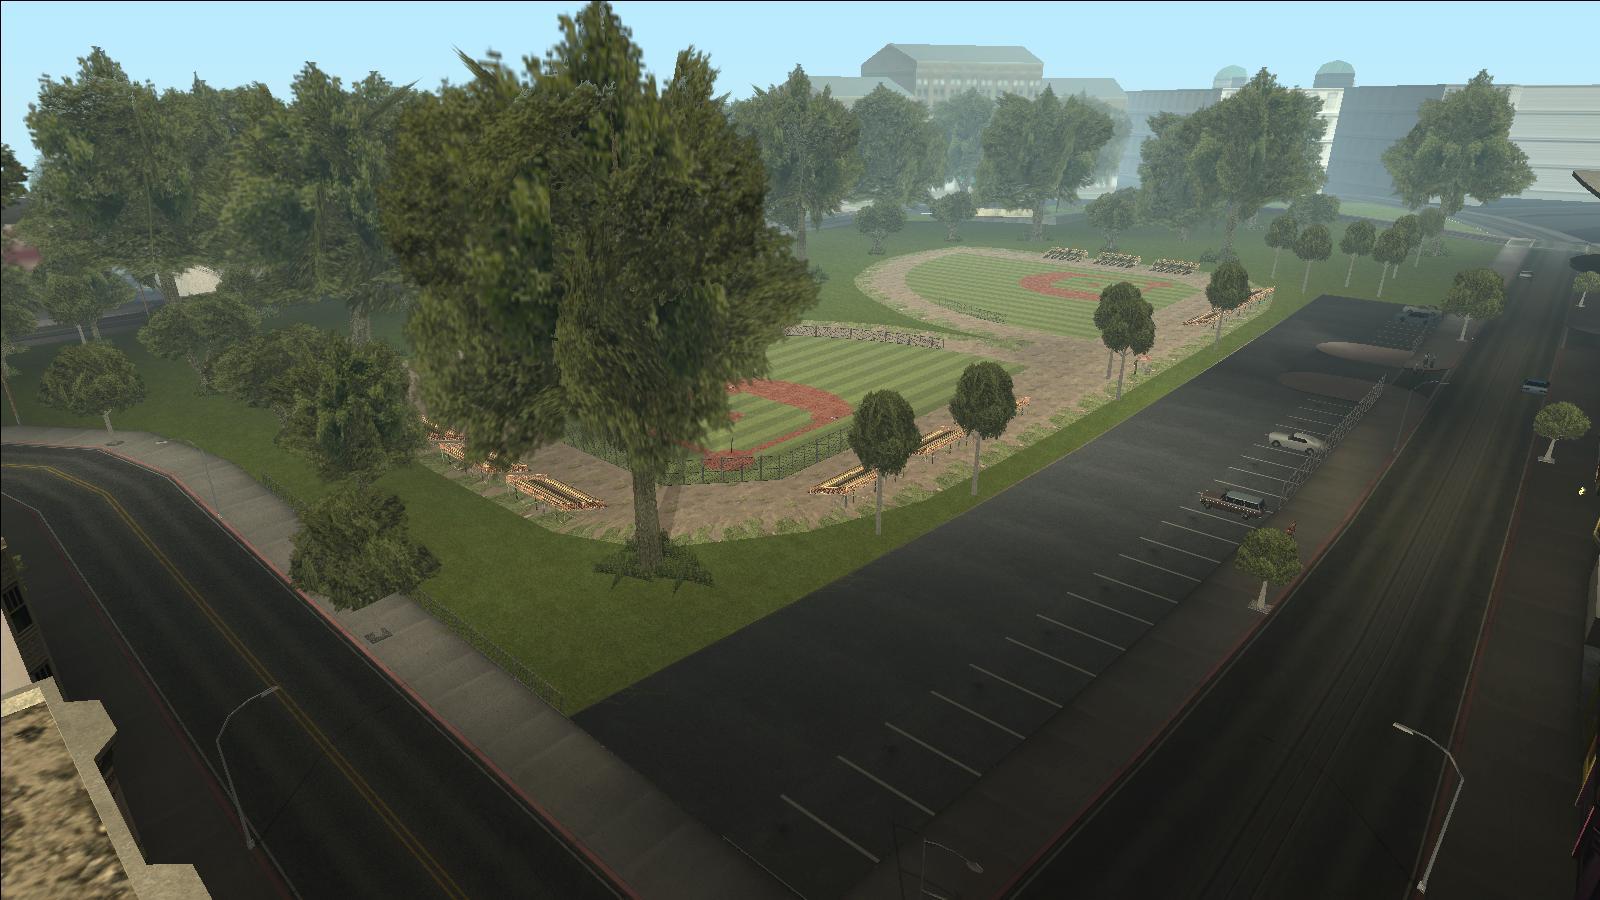 Garcia Baseball Park